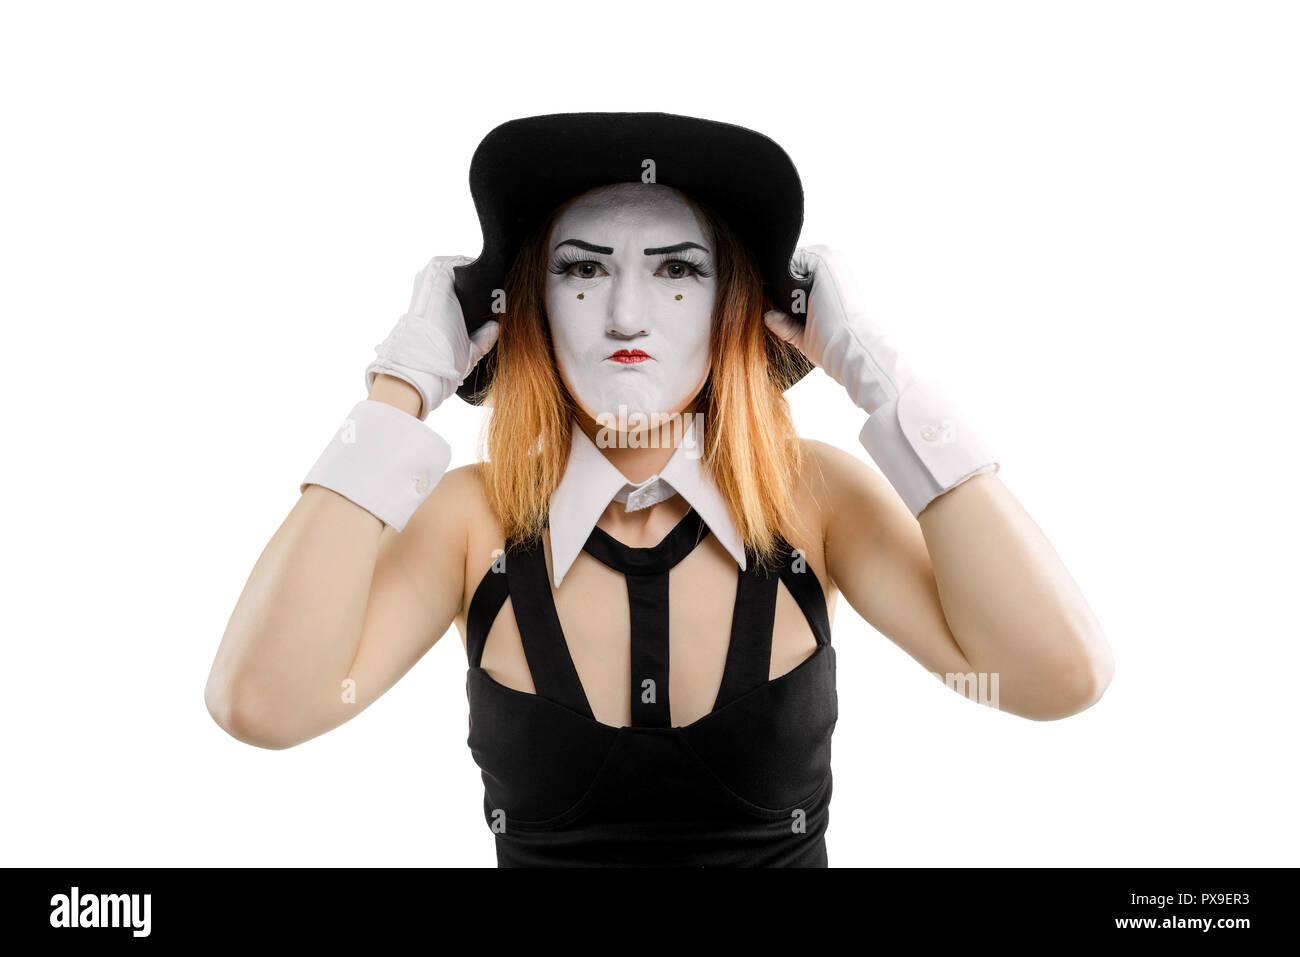 Female mime as grumpy woman - Stock Image